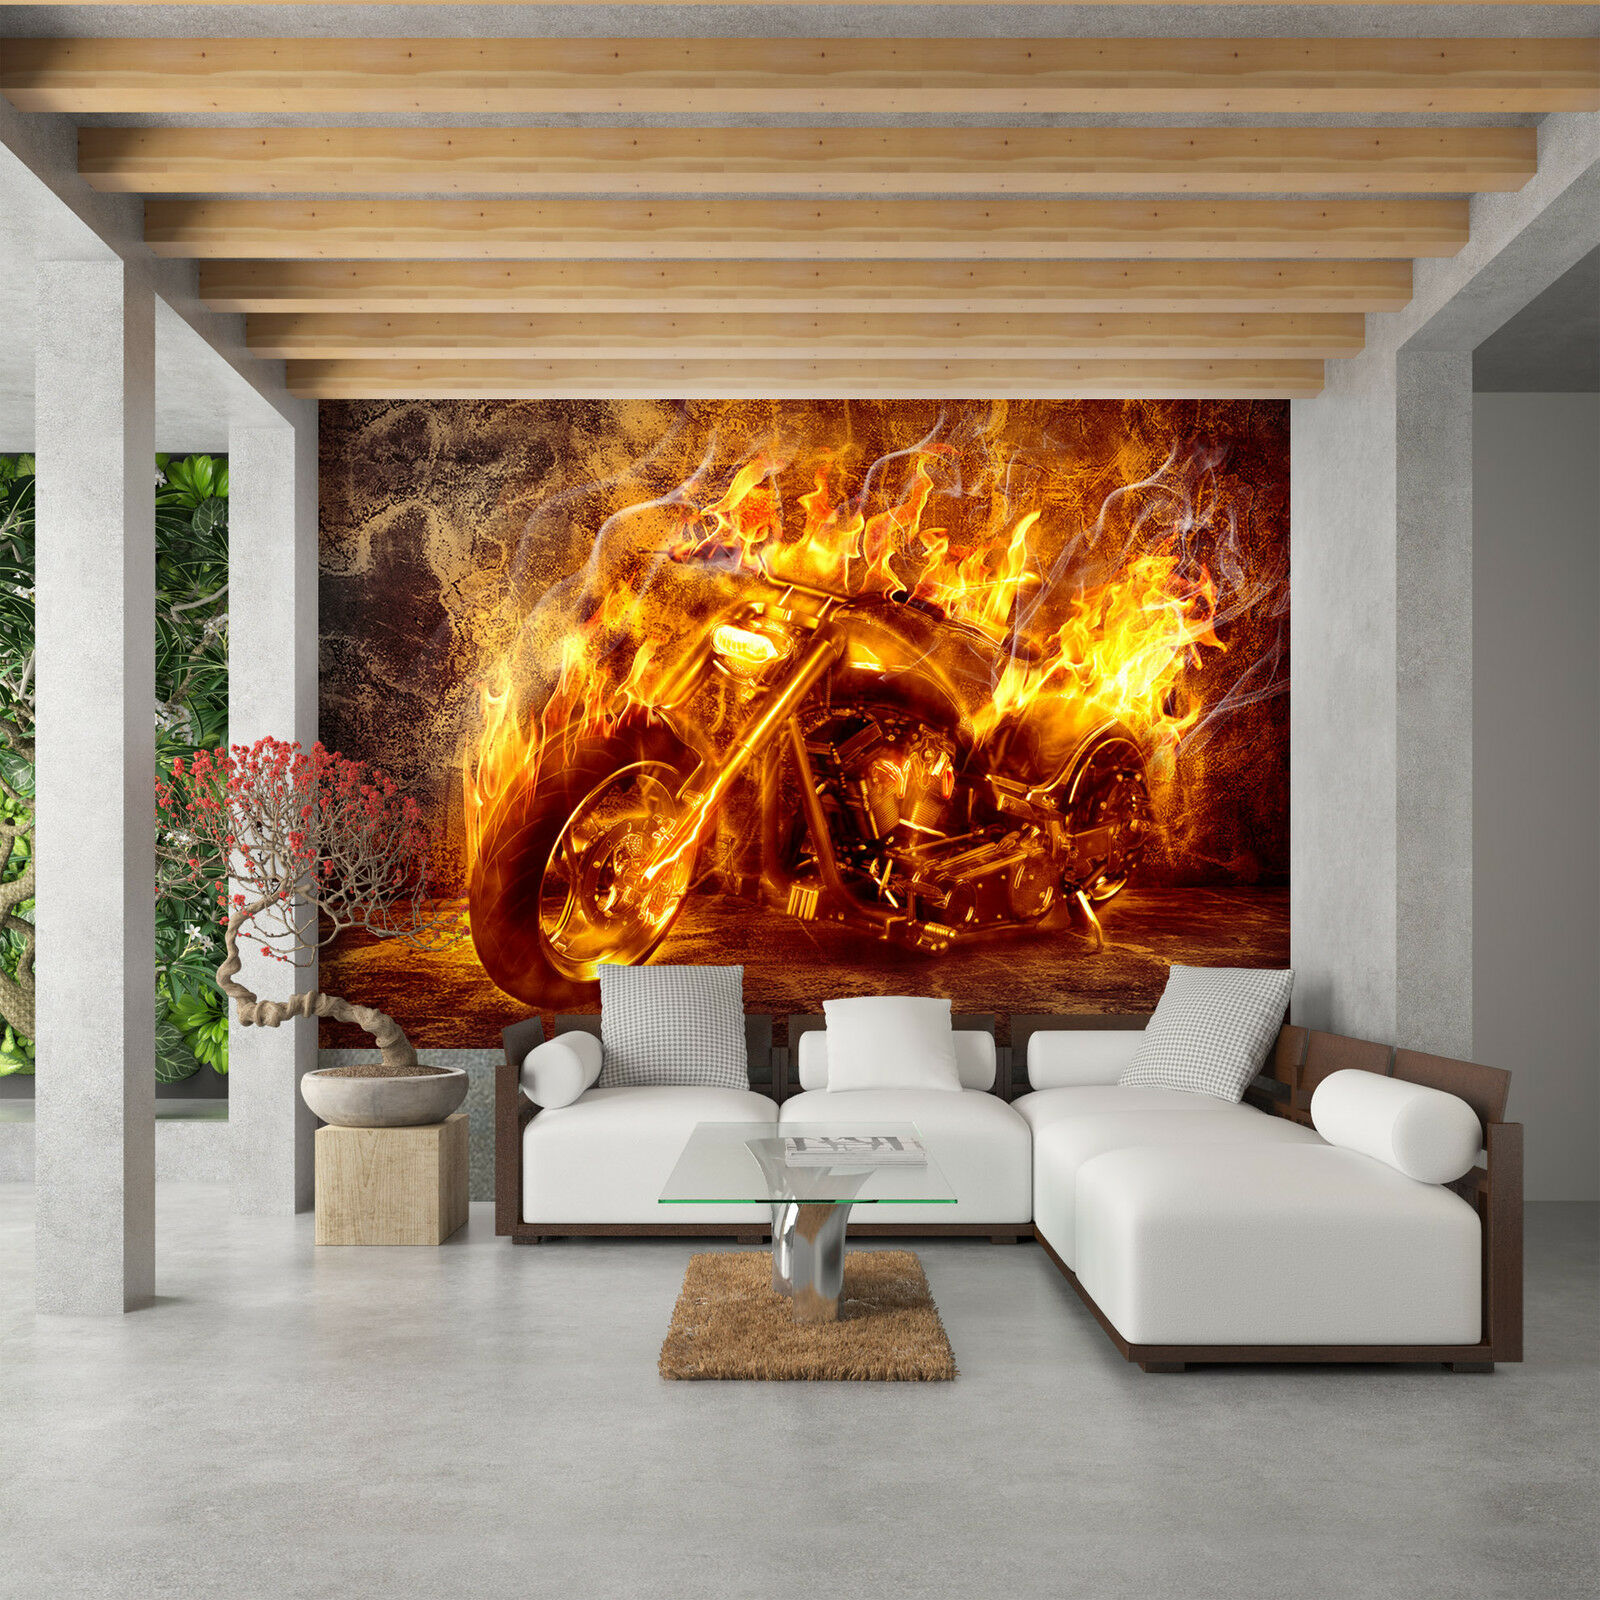 Tapete Vlies Fototapete modernes Design Motorrad Harley Chopper in Flammen Feuer